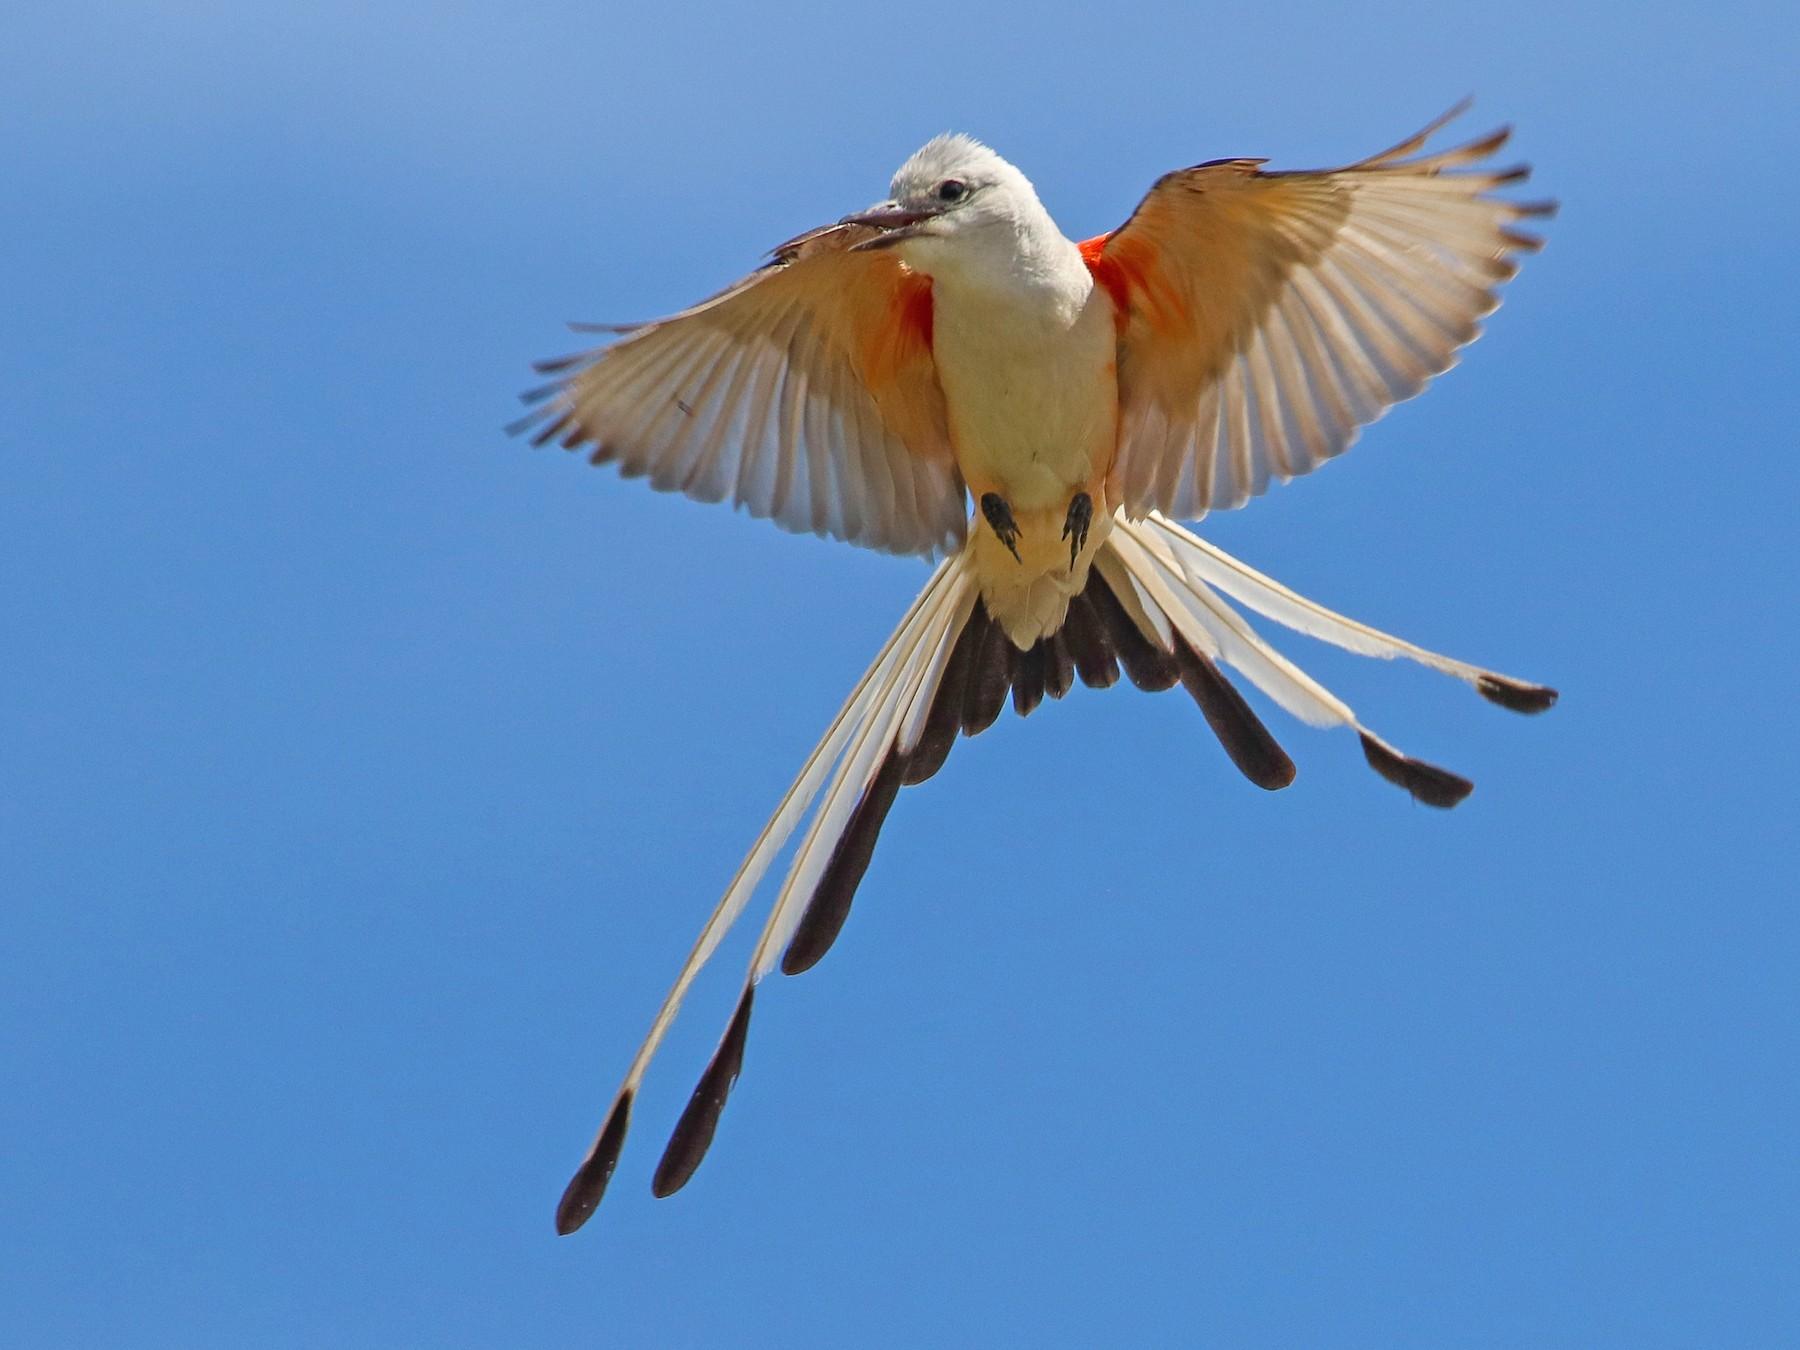 Scissor-tailed Flycatcher - Martina Nordstrand